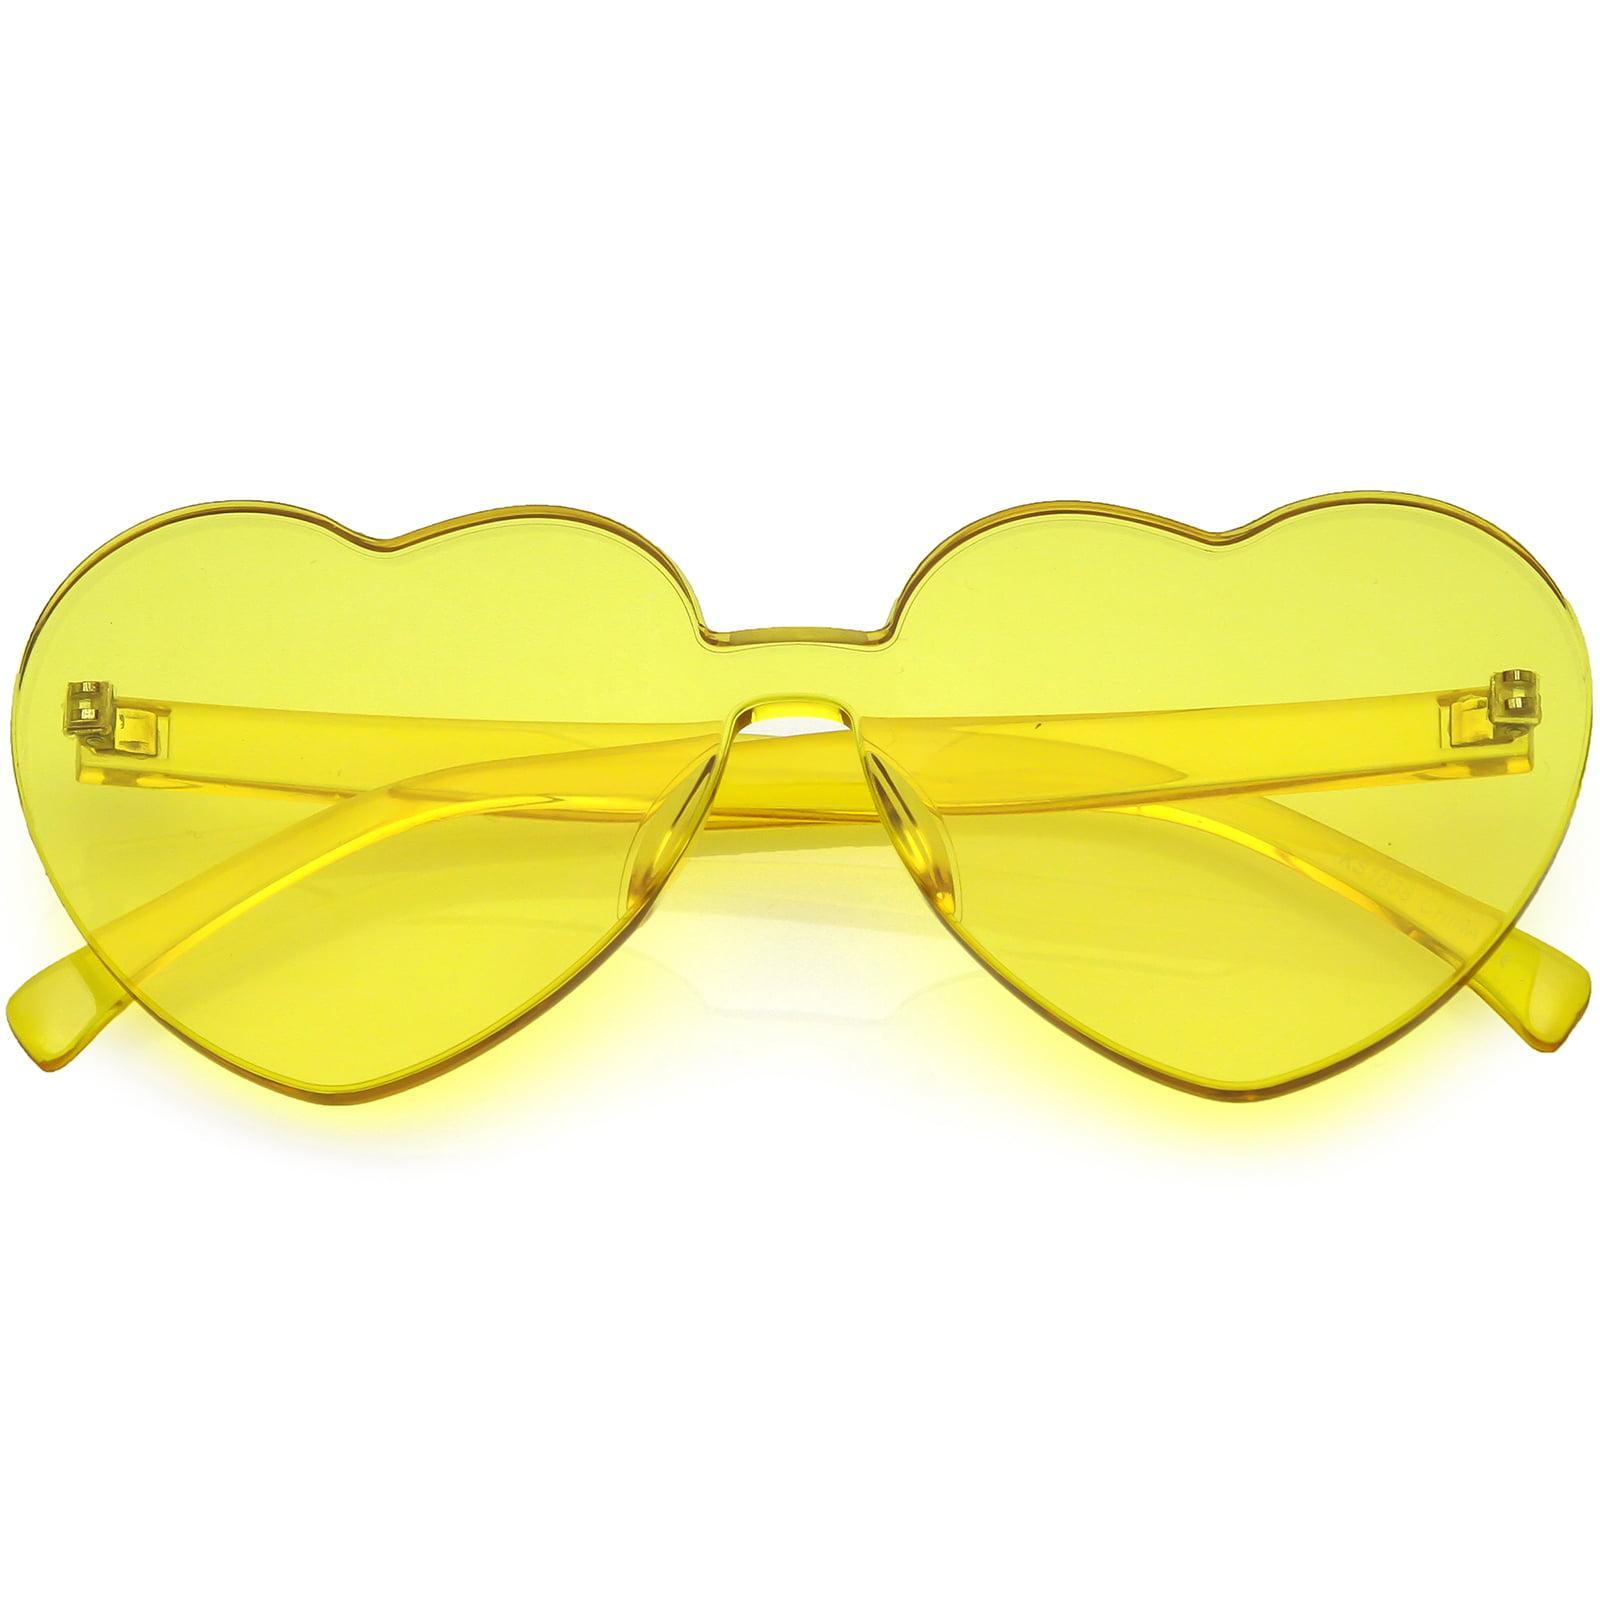 sunglassLA - One Piece Rimless Heart Sunglasses Color Tinted Mono Block Lens 65mm - 65mm